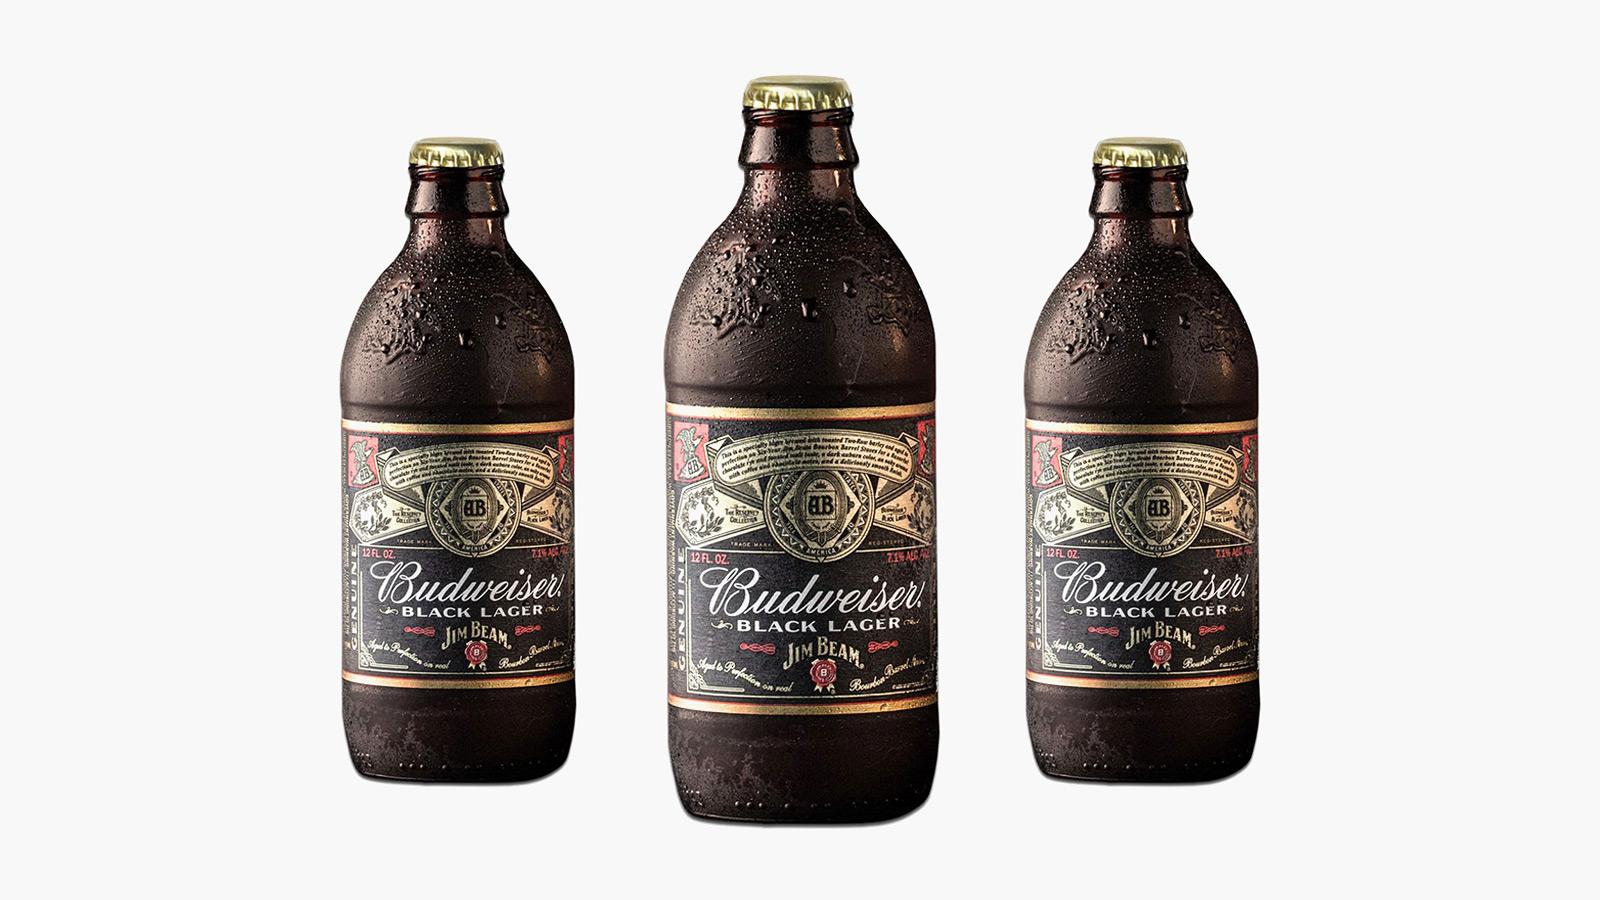 Budweiser x Jim Beam Reserve Black Lager